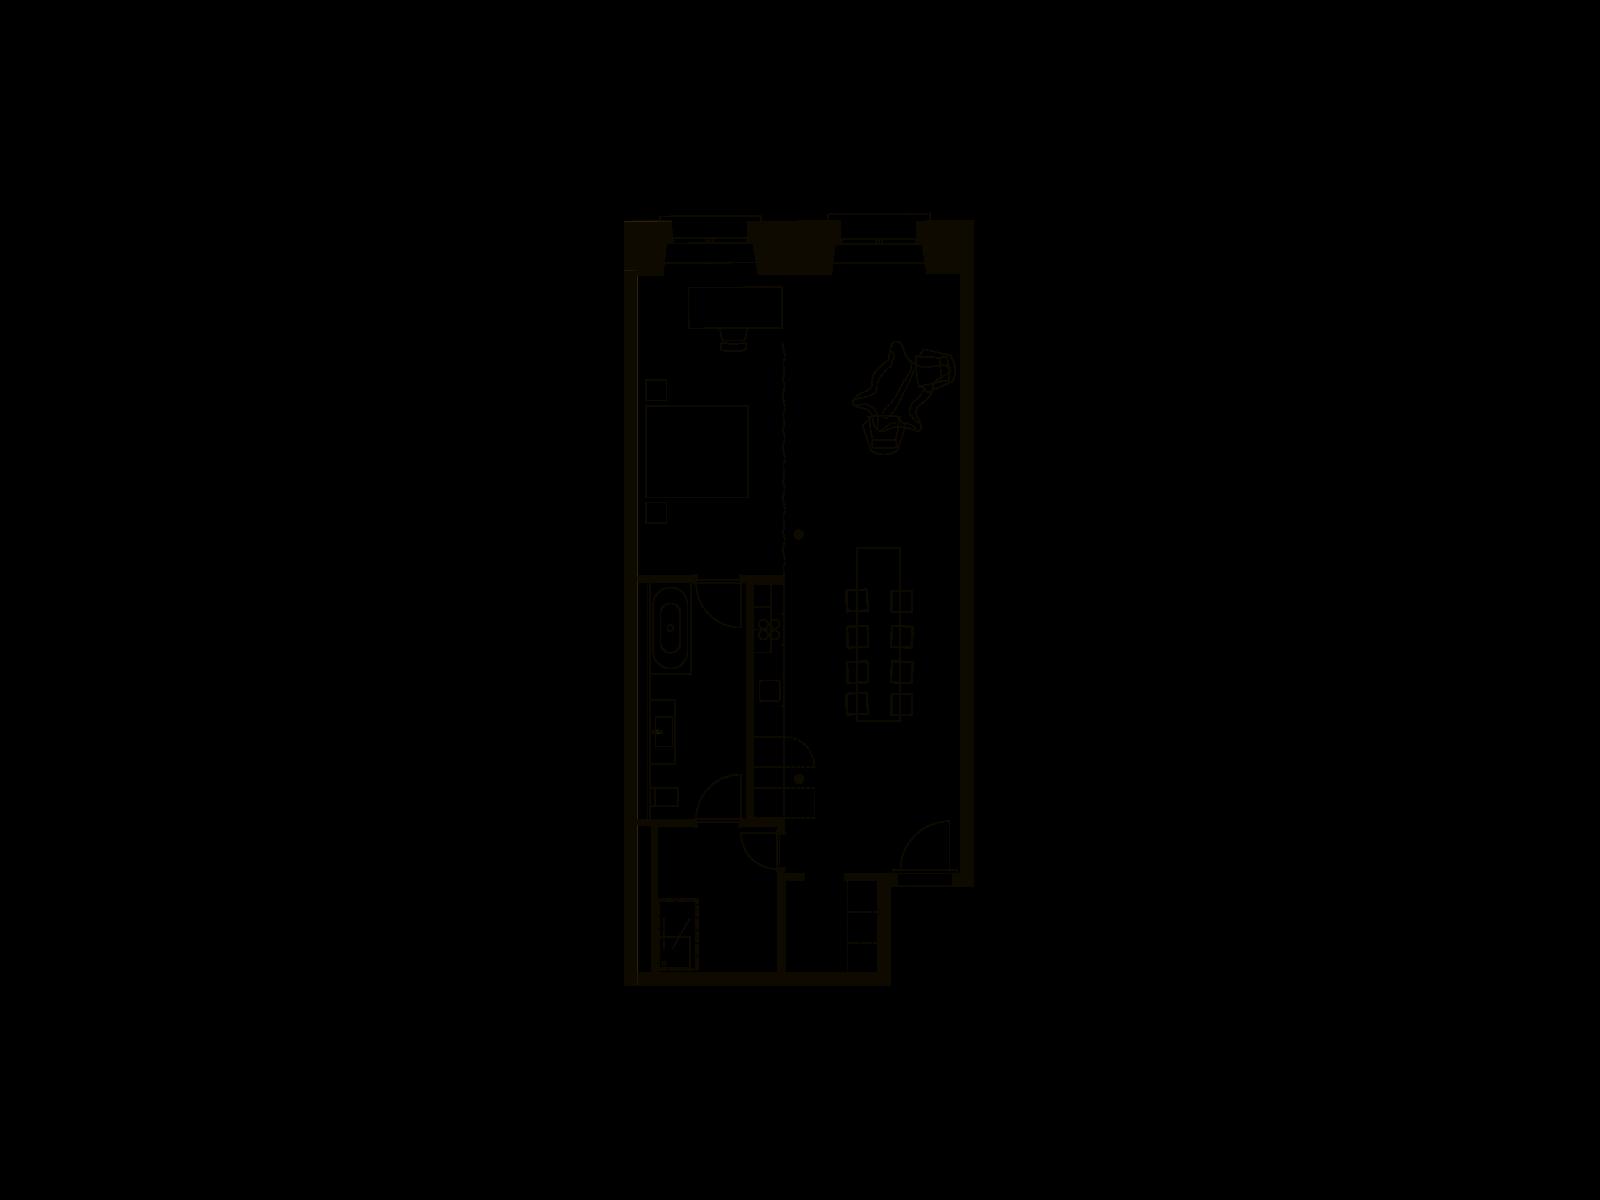 E.2.03-1